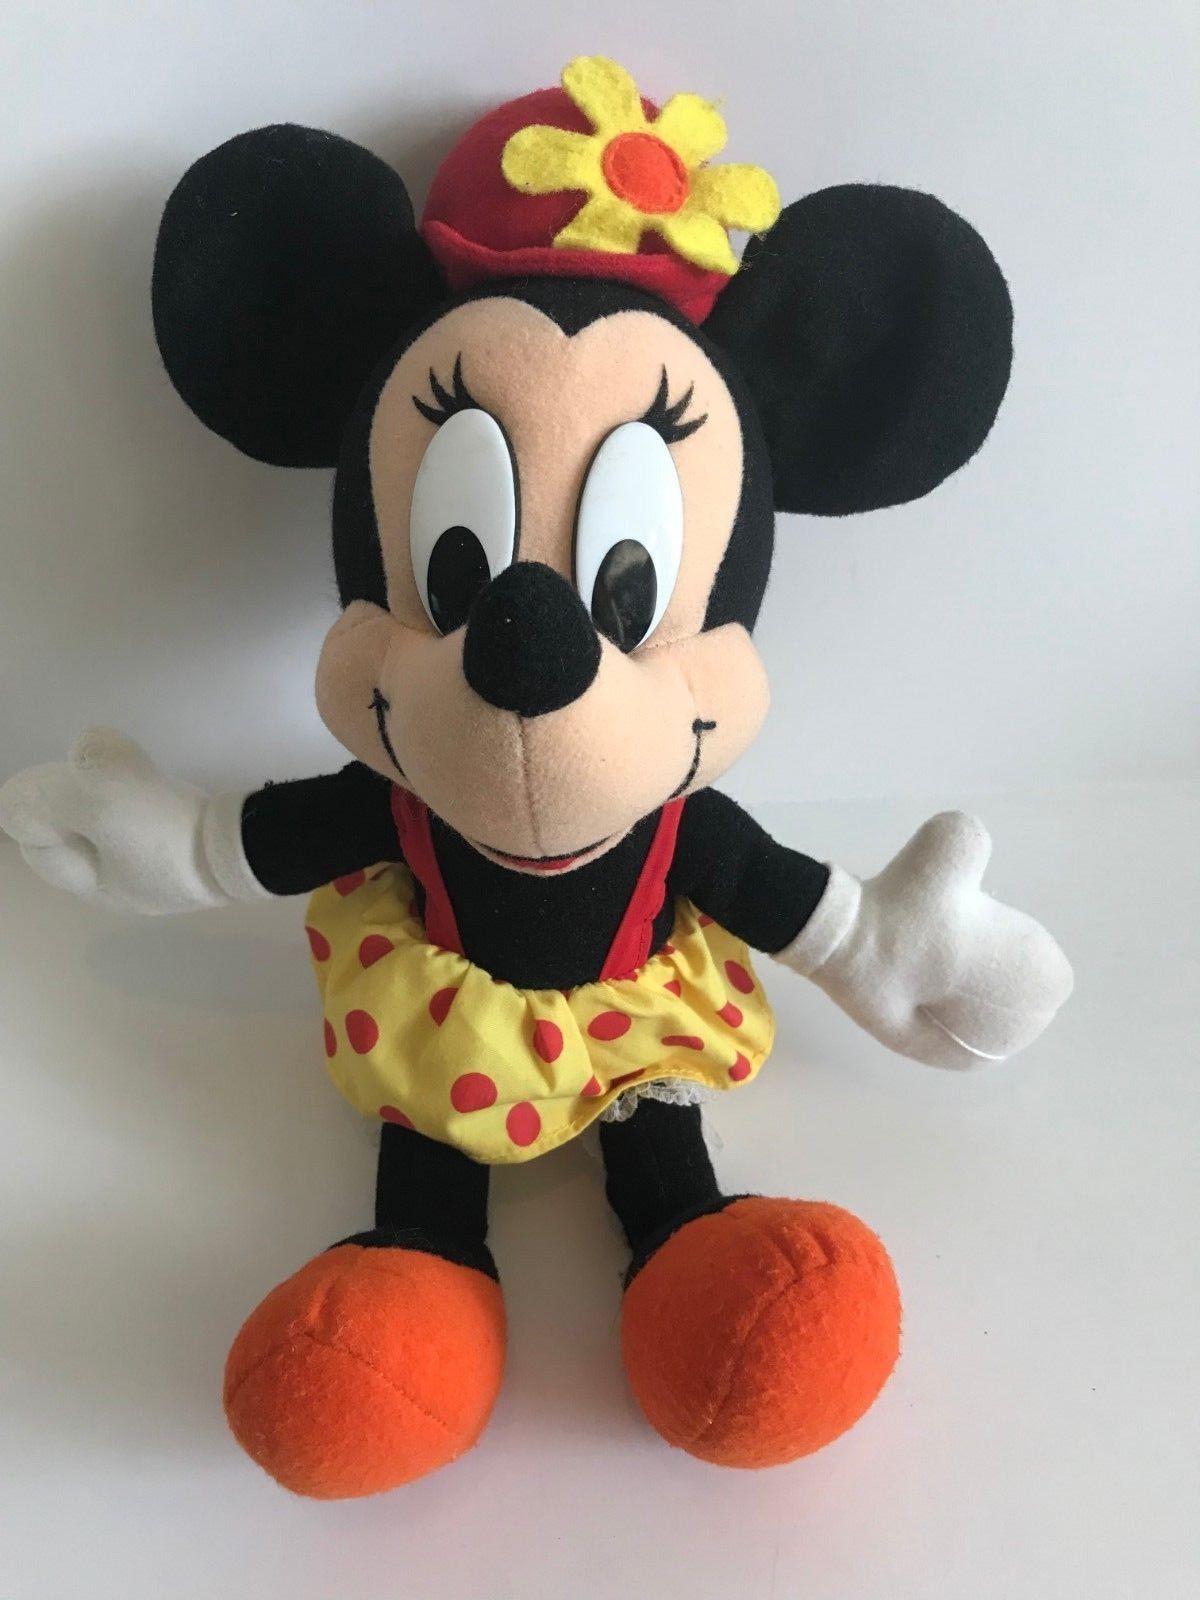 Mattel Arcotoys Minnie Mouse Yellow Red Polka Dot Flower Hat Plush Stuffed Doll